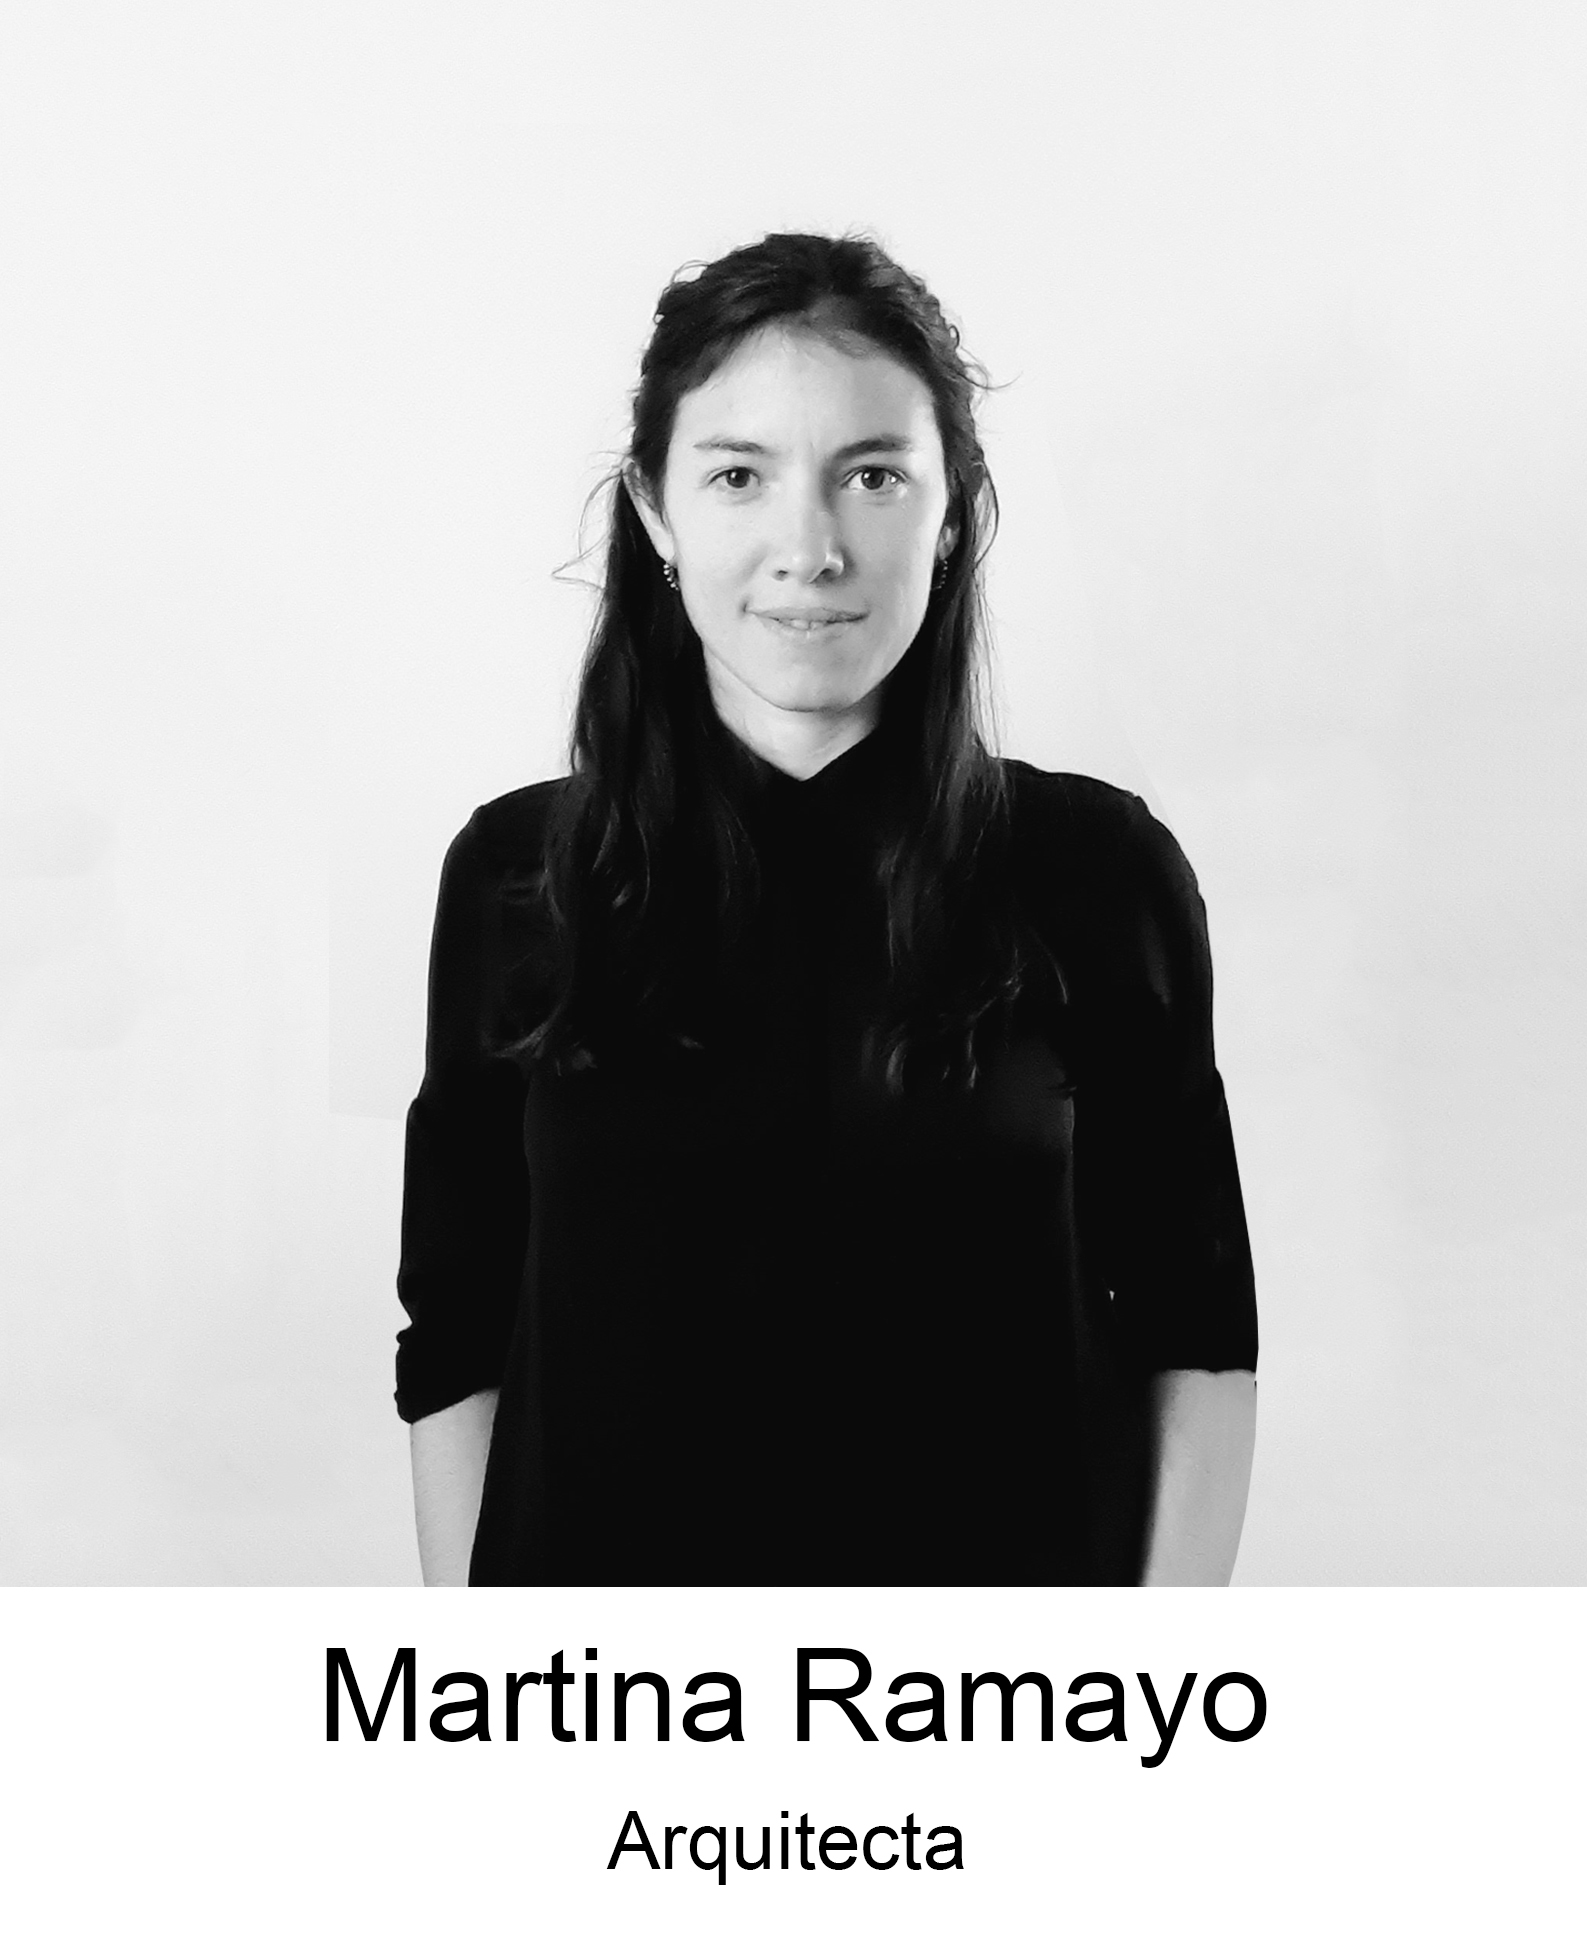 Martina Ramayo